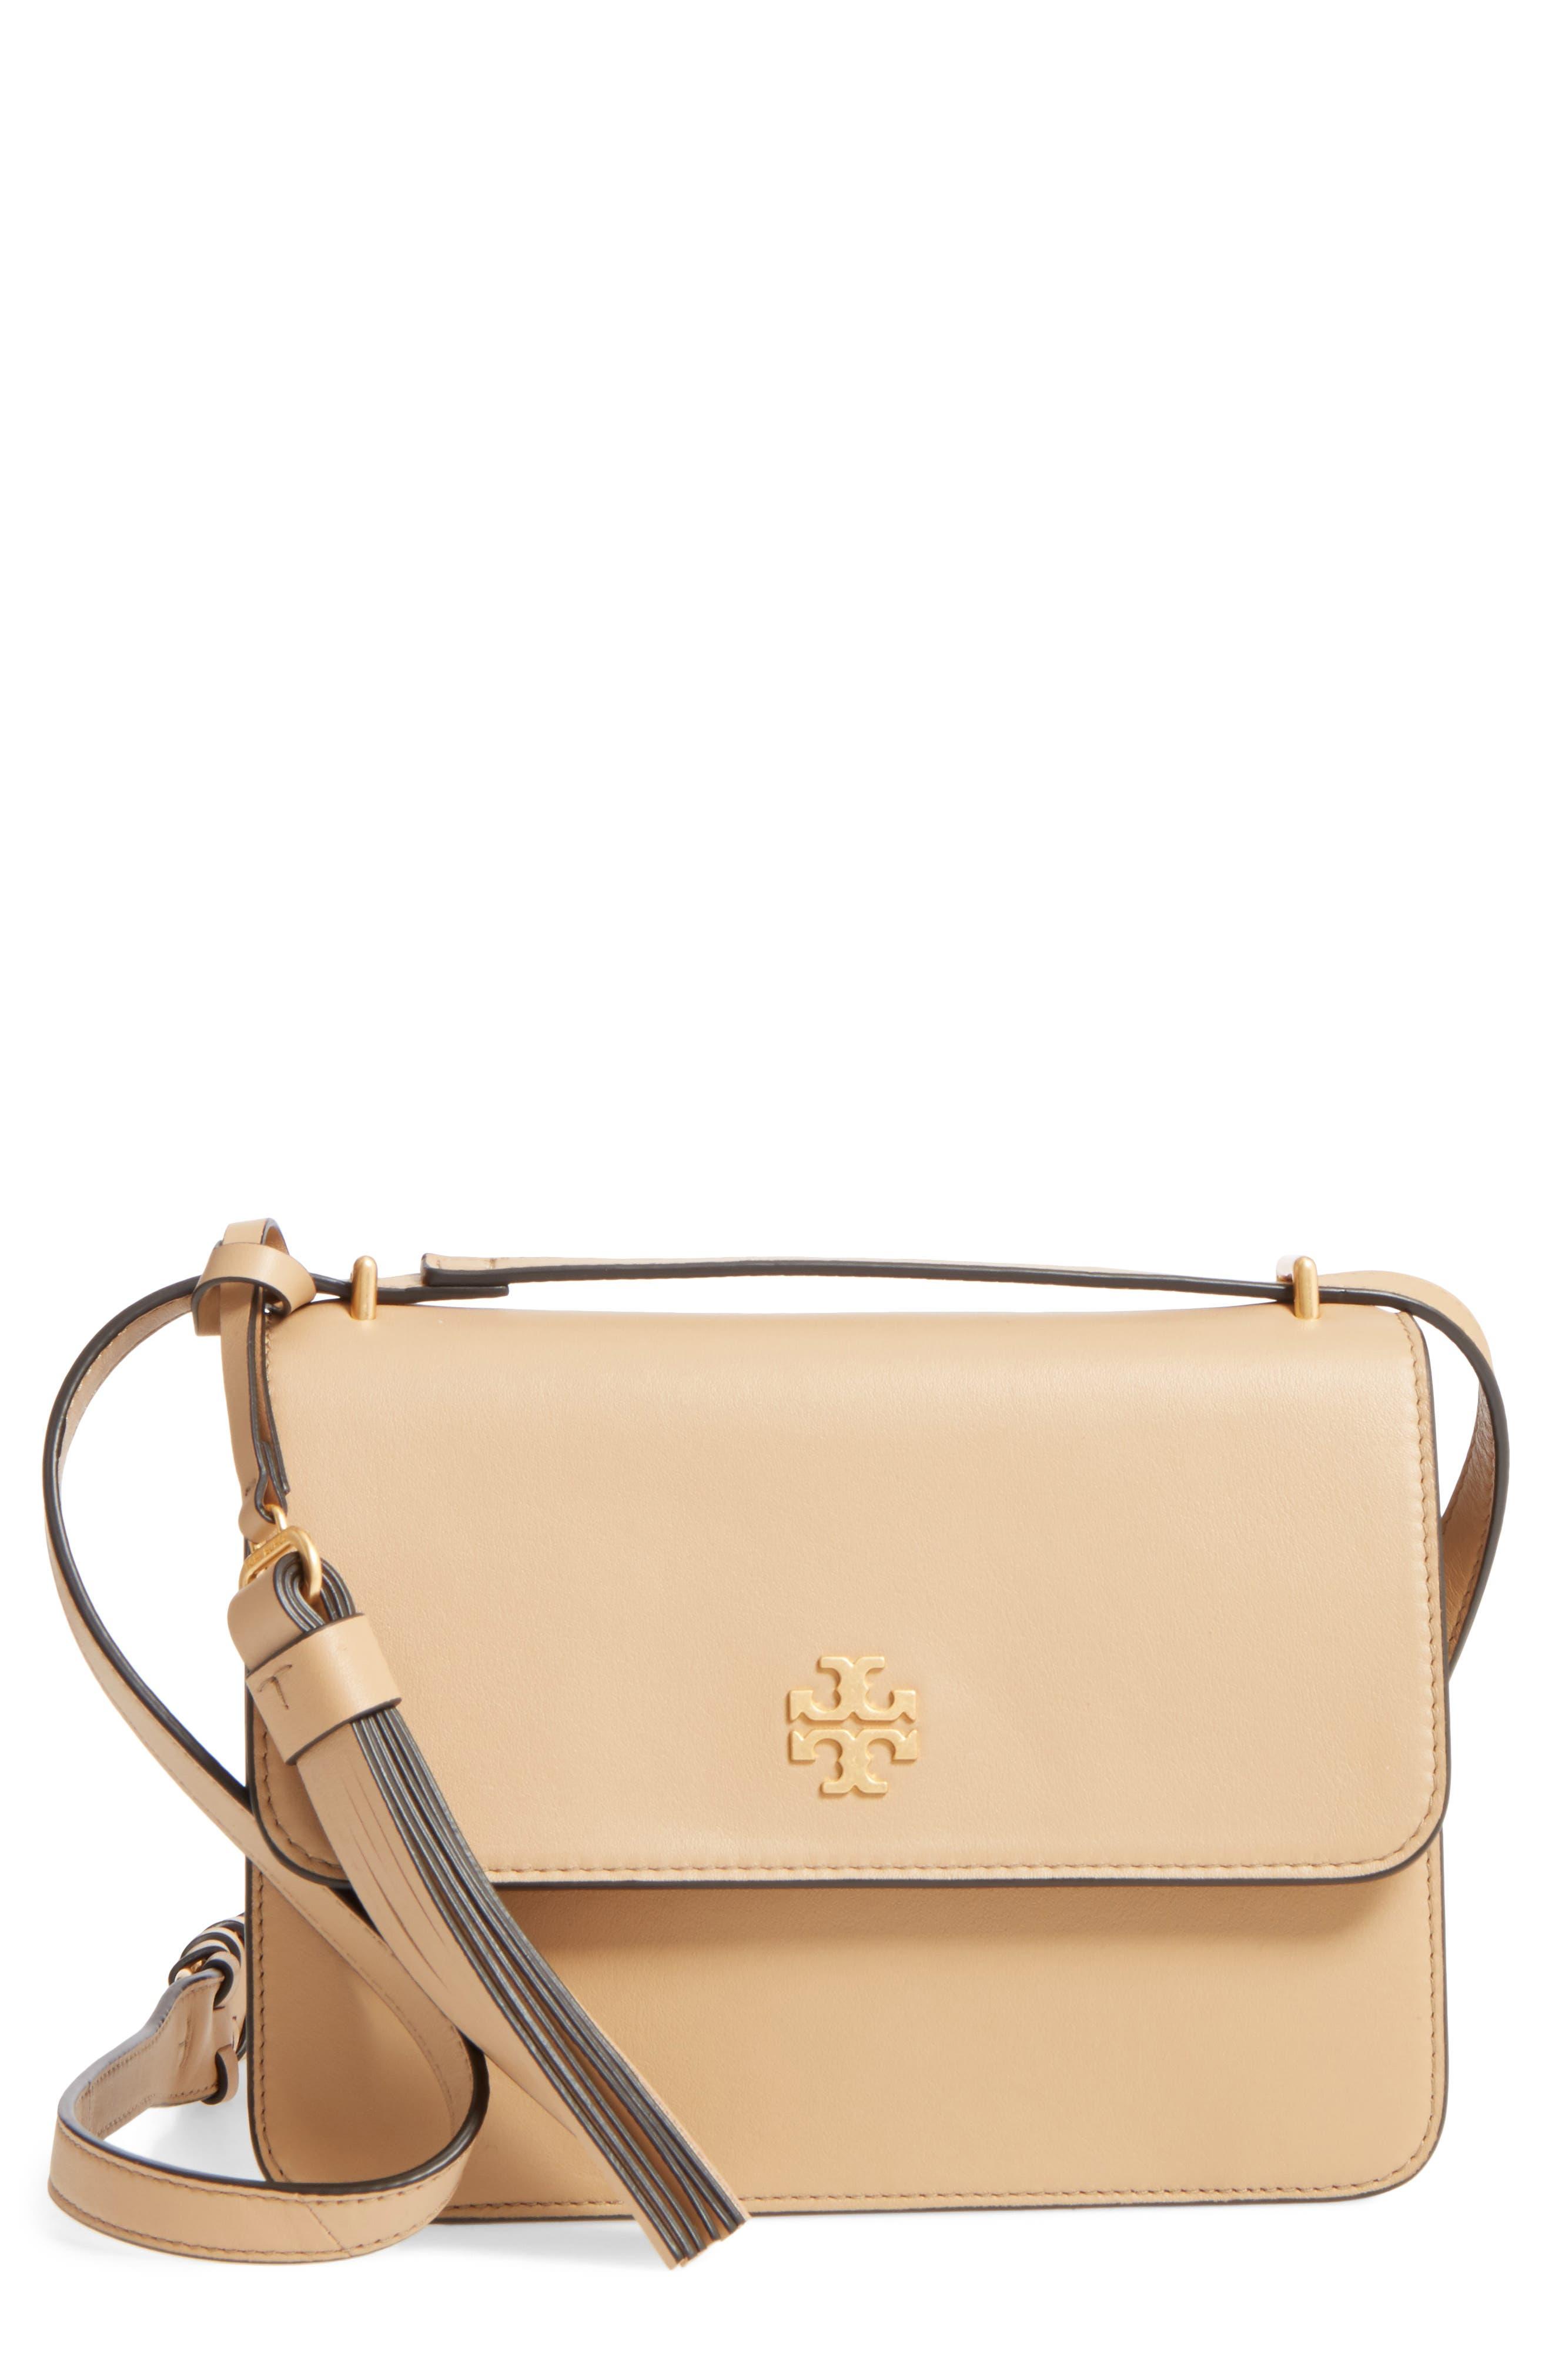 Tory Burch Brooke Leather Crossbody Bag